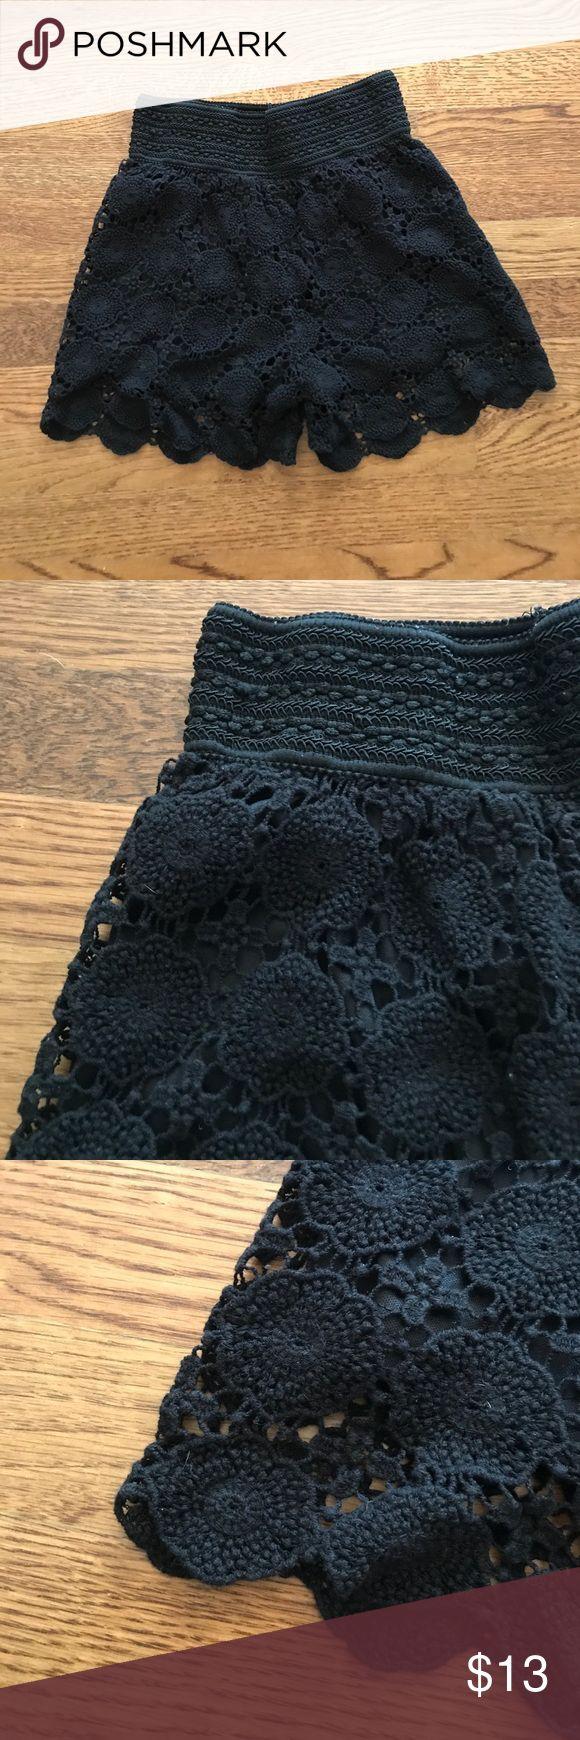 Black Crochet Shorts Black fully lined , elastic waistband Shorts